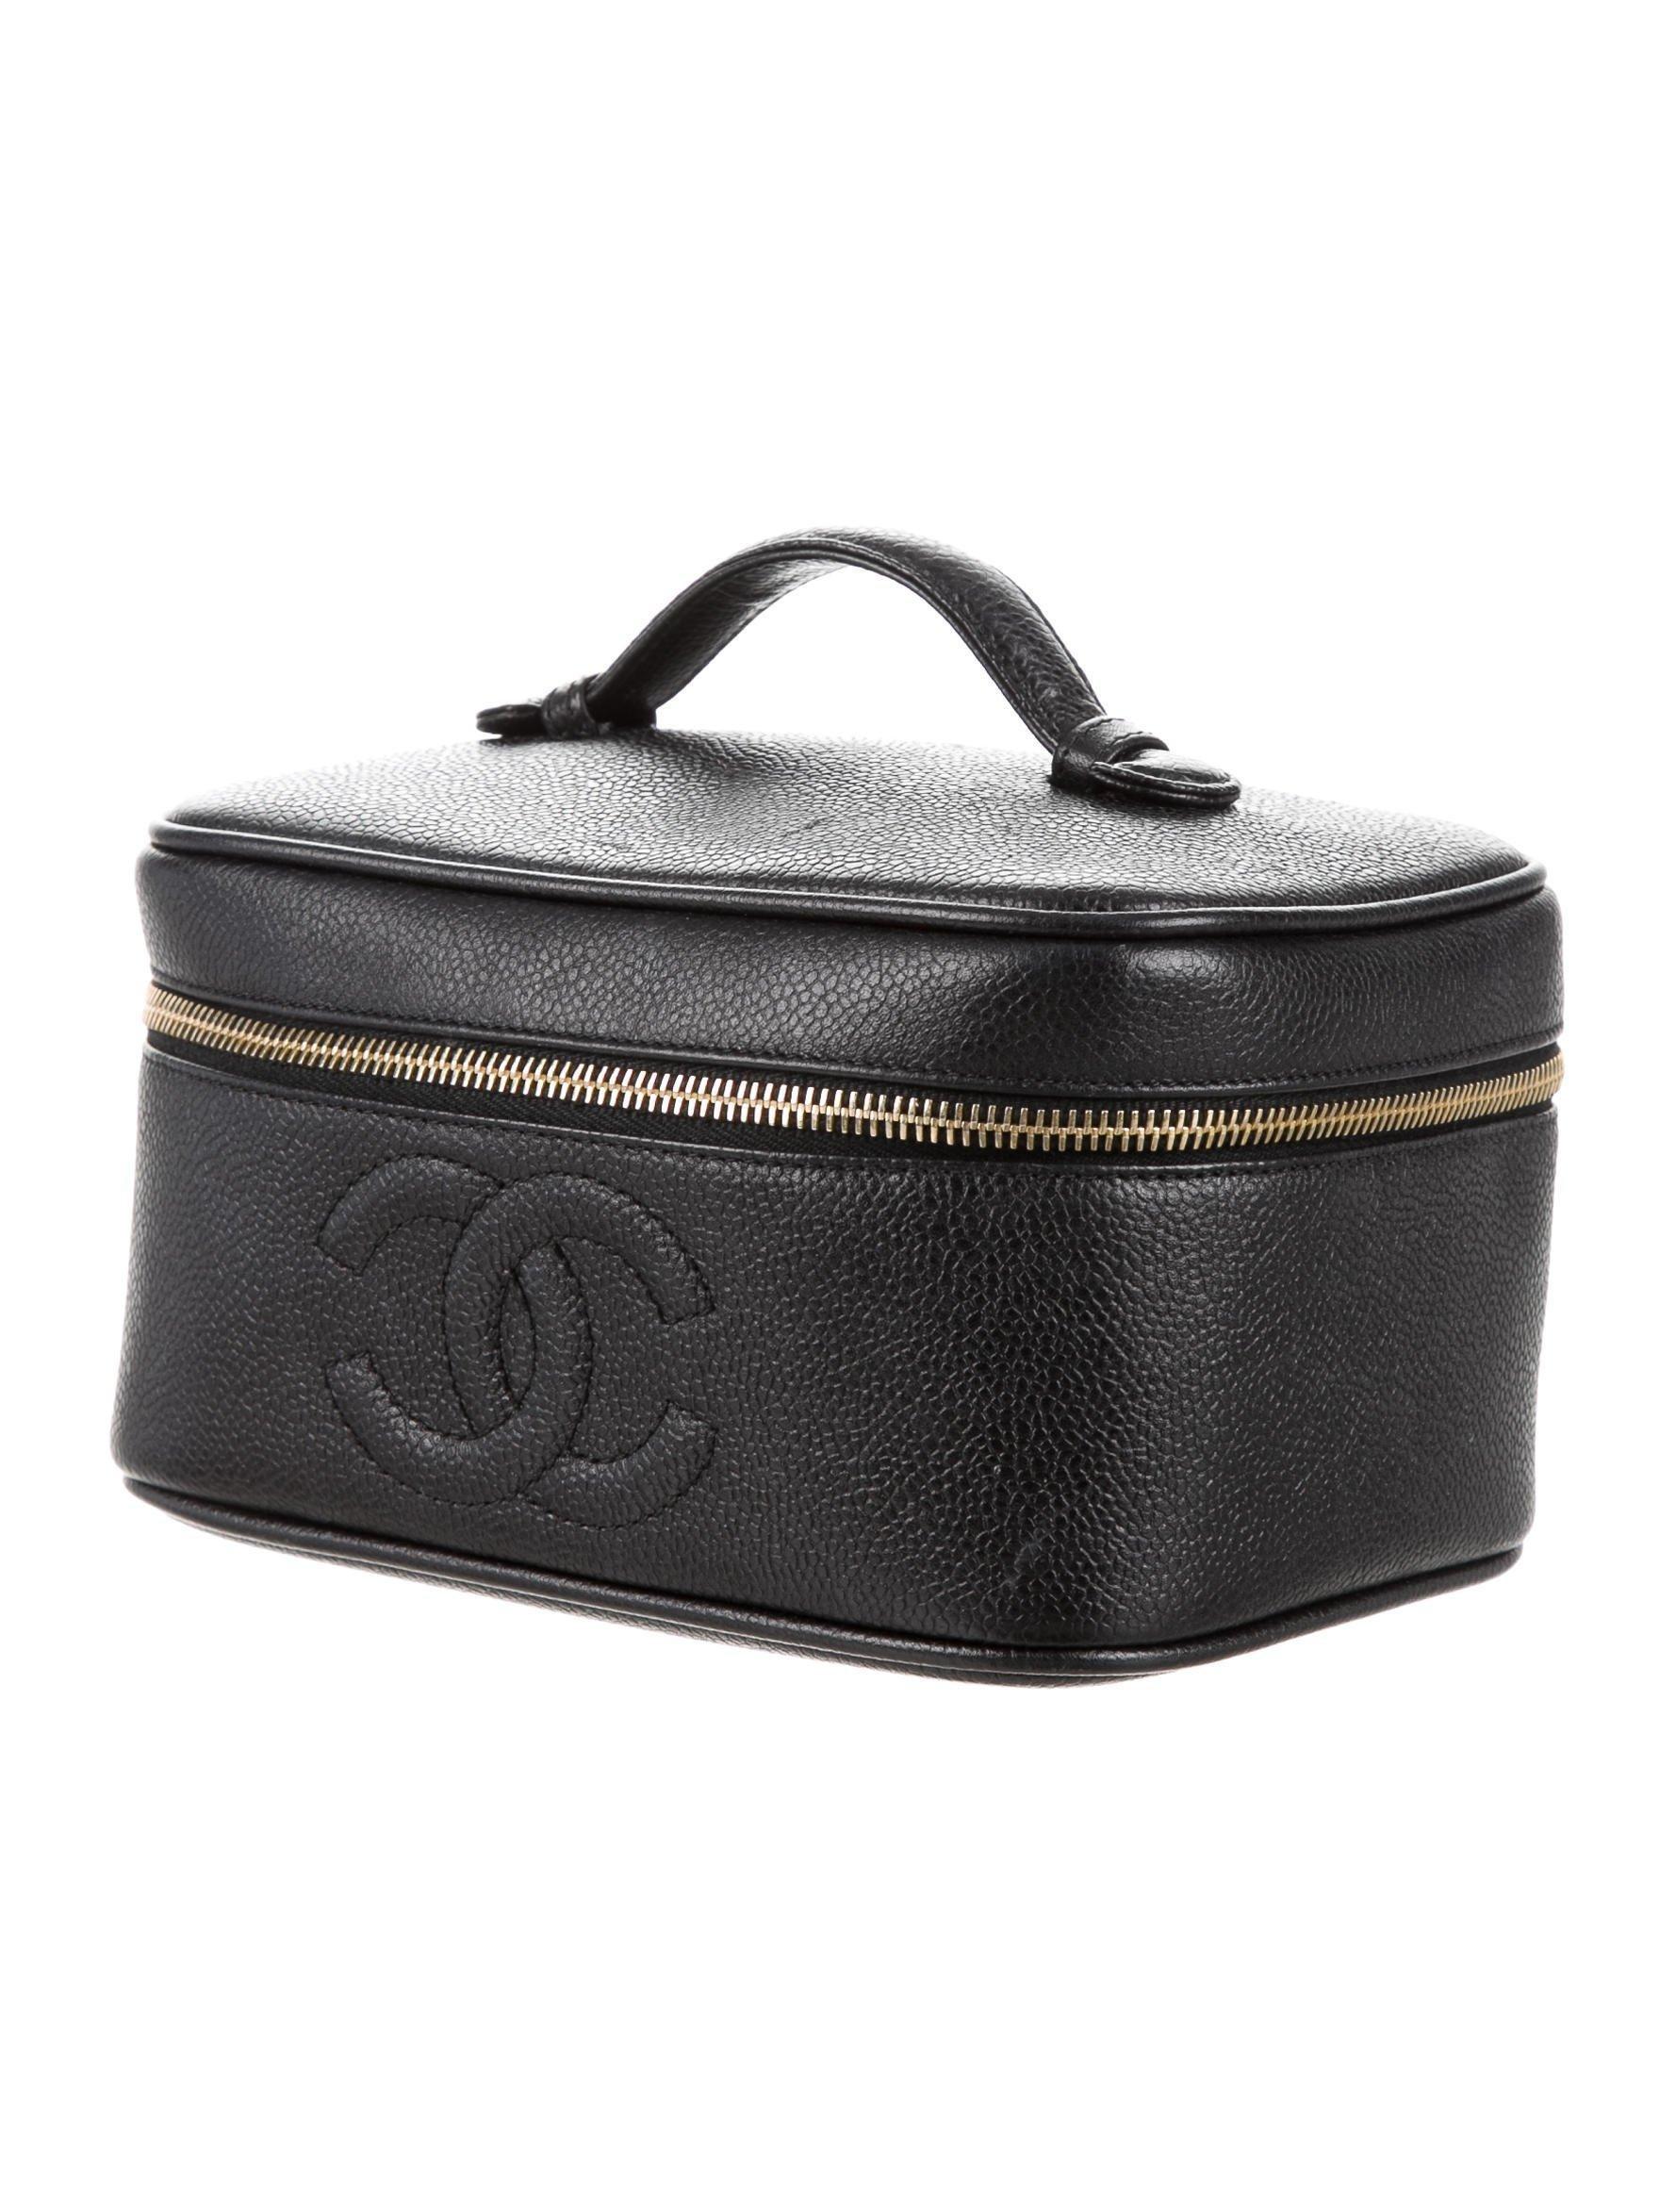 1948a40d7464 Lyst - Chanel Caviar Vanity Case Black in Metallic